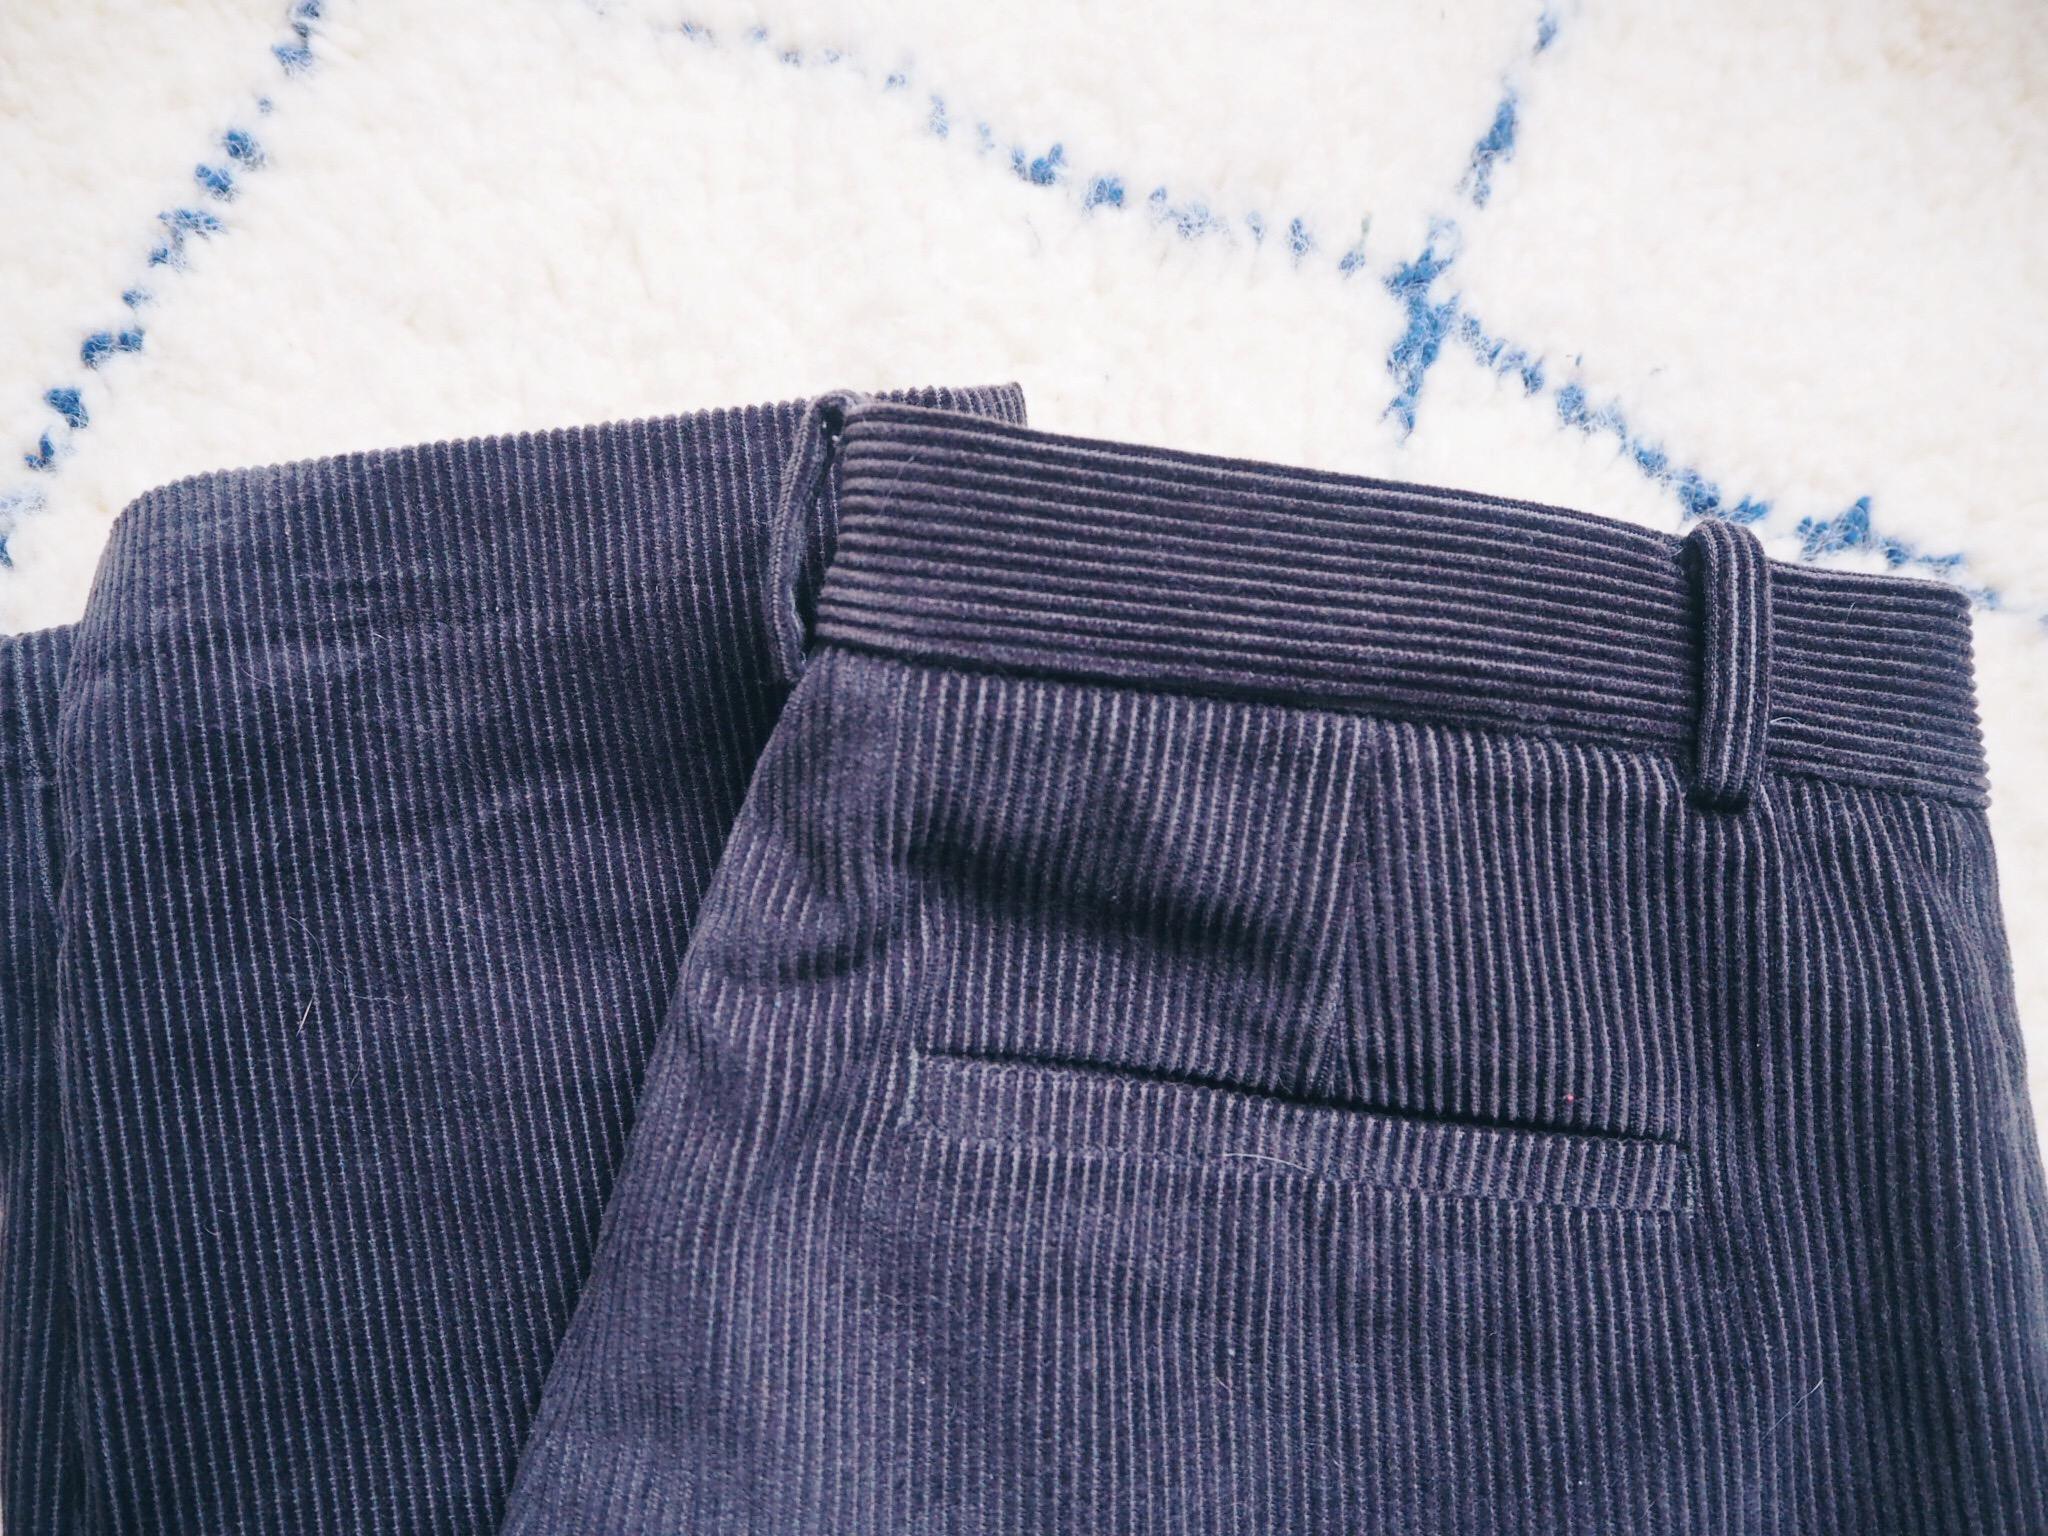 pantalon en velours c tel homme. Black Bedroom Furniture Sets. Home Design Ideas